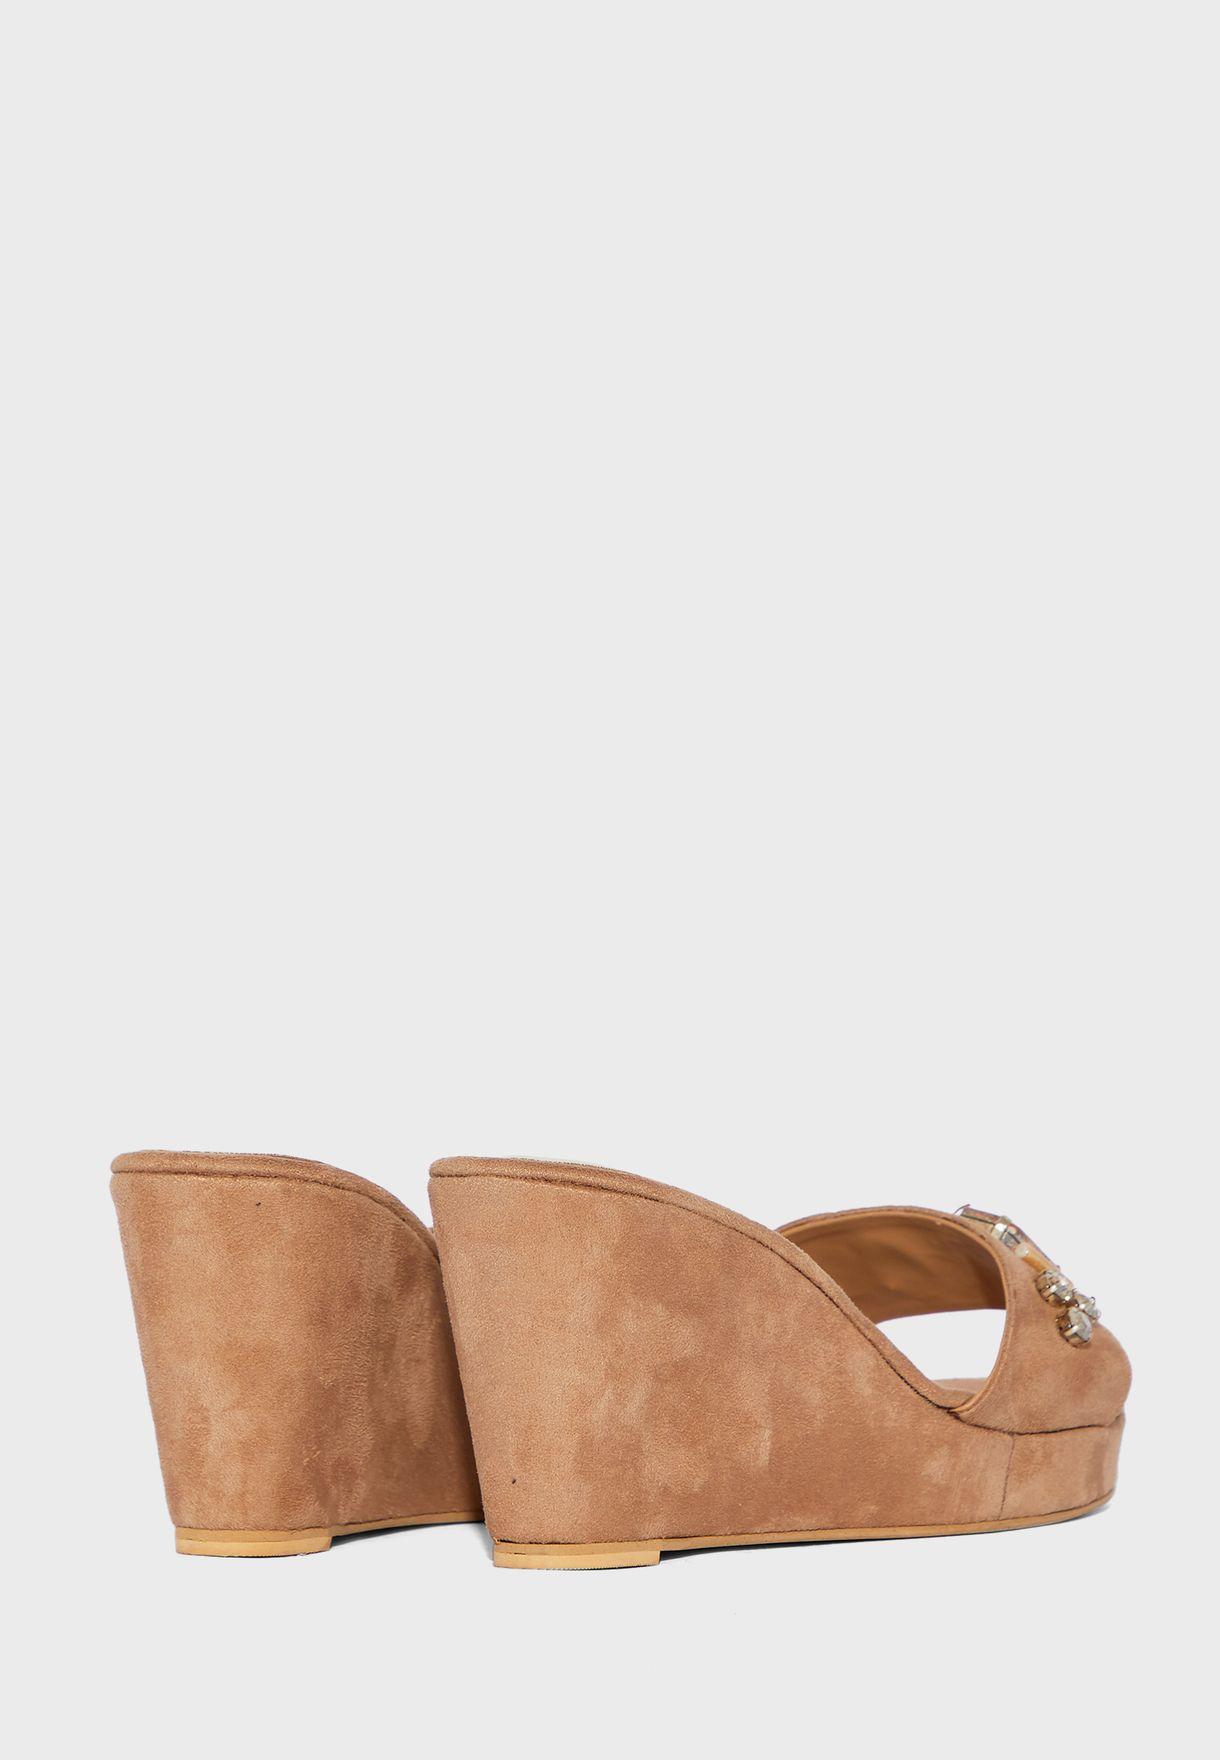 Knot Detail High Heel Wedge Sandals